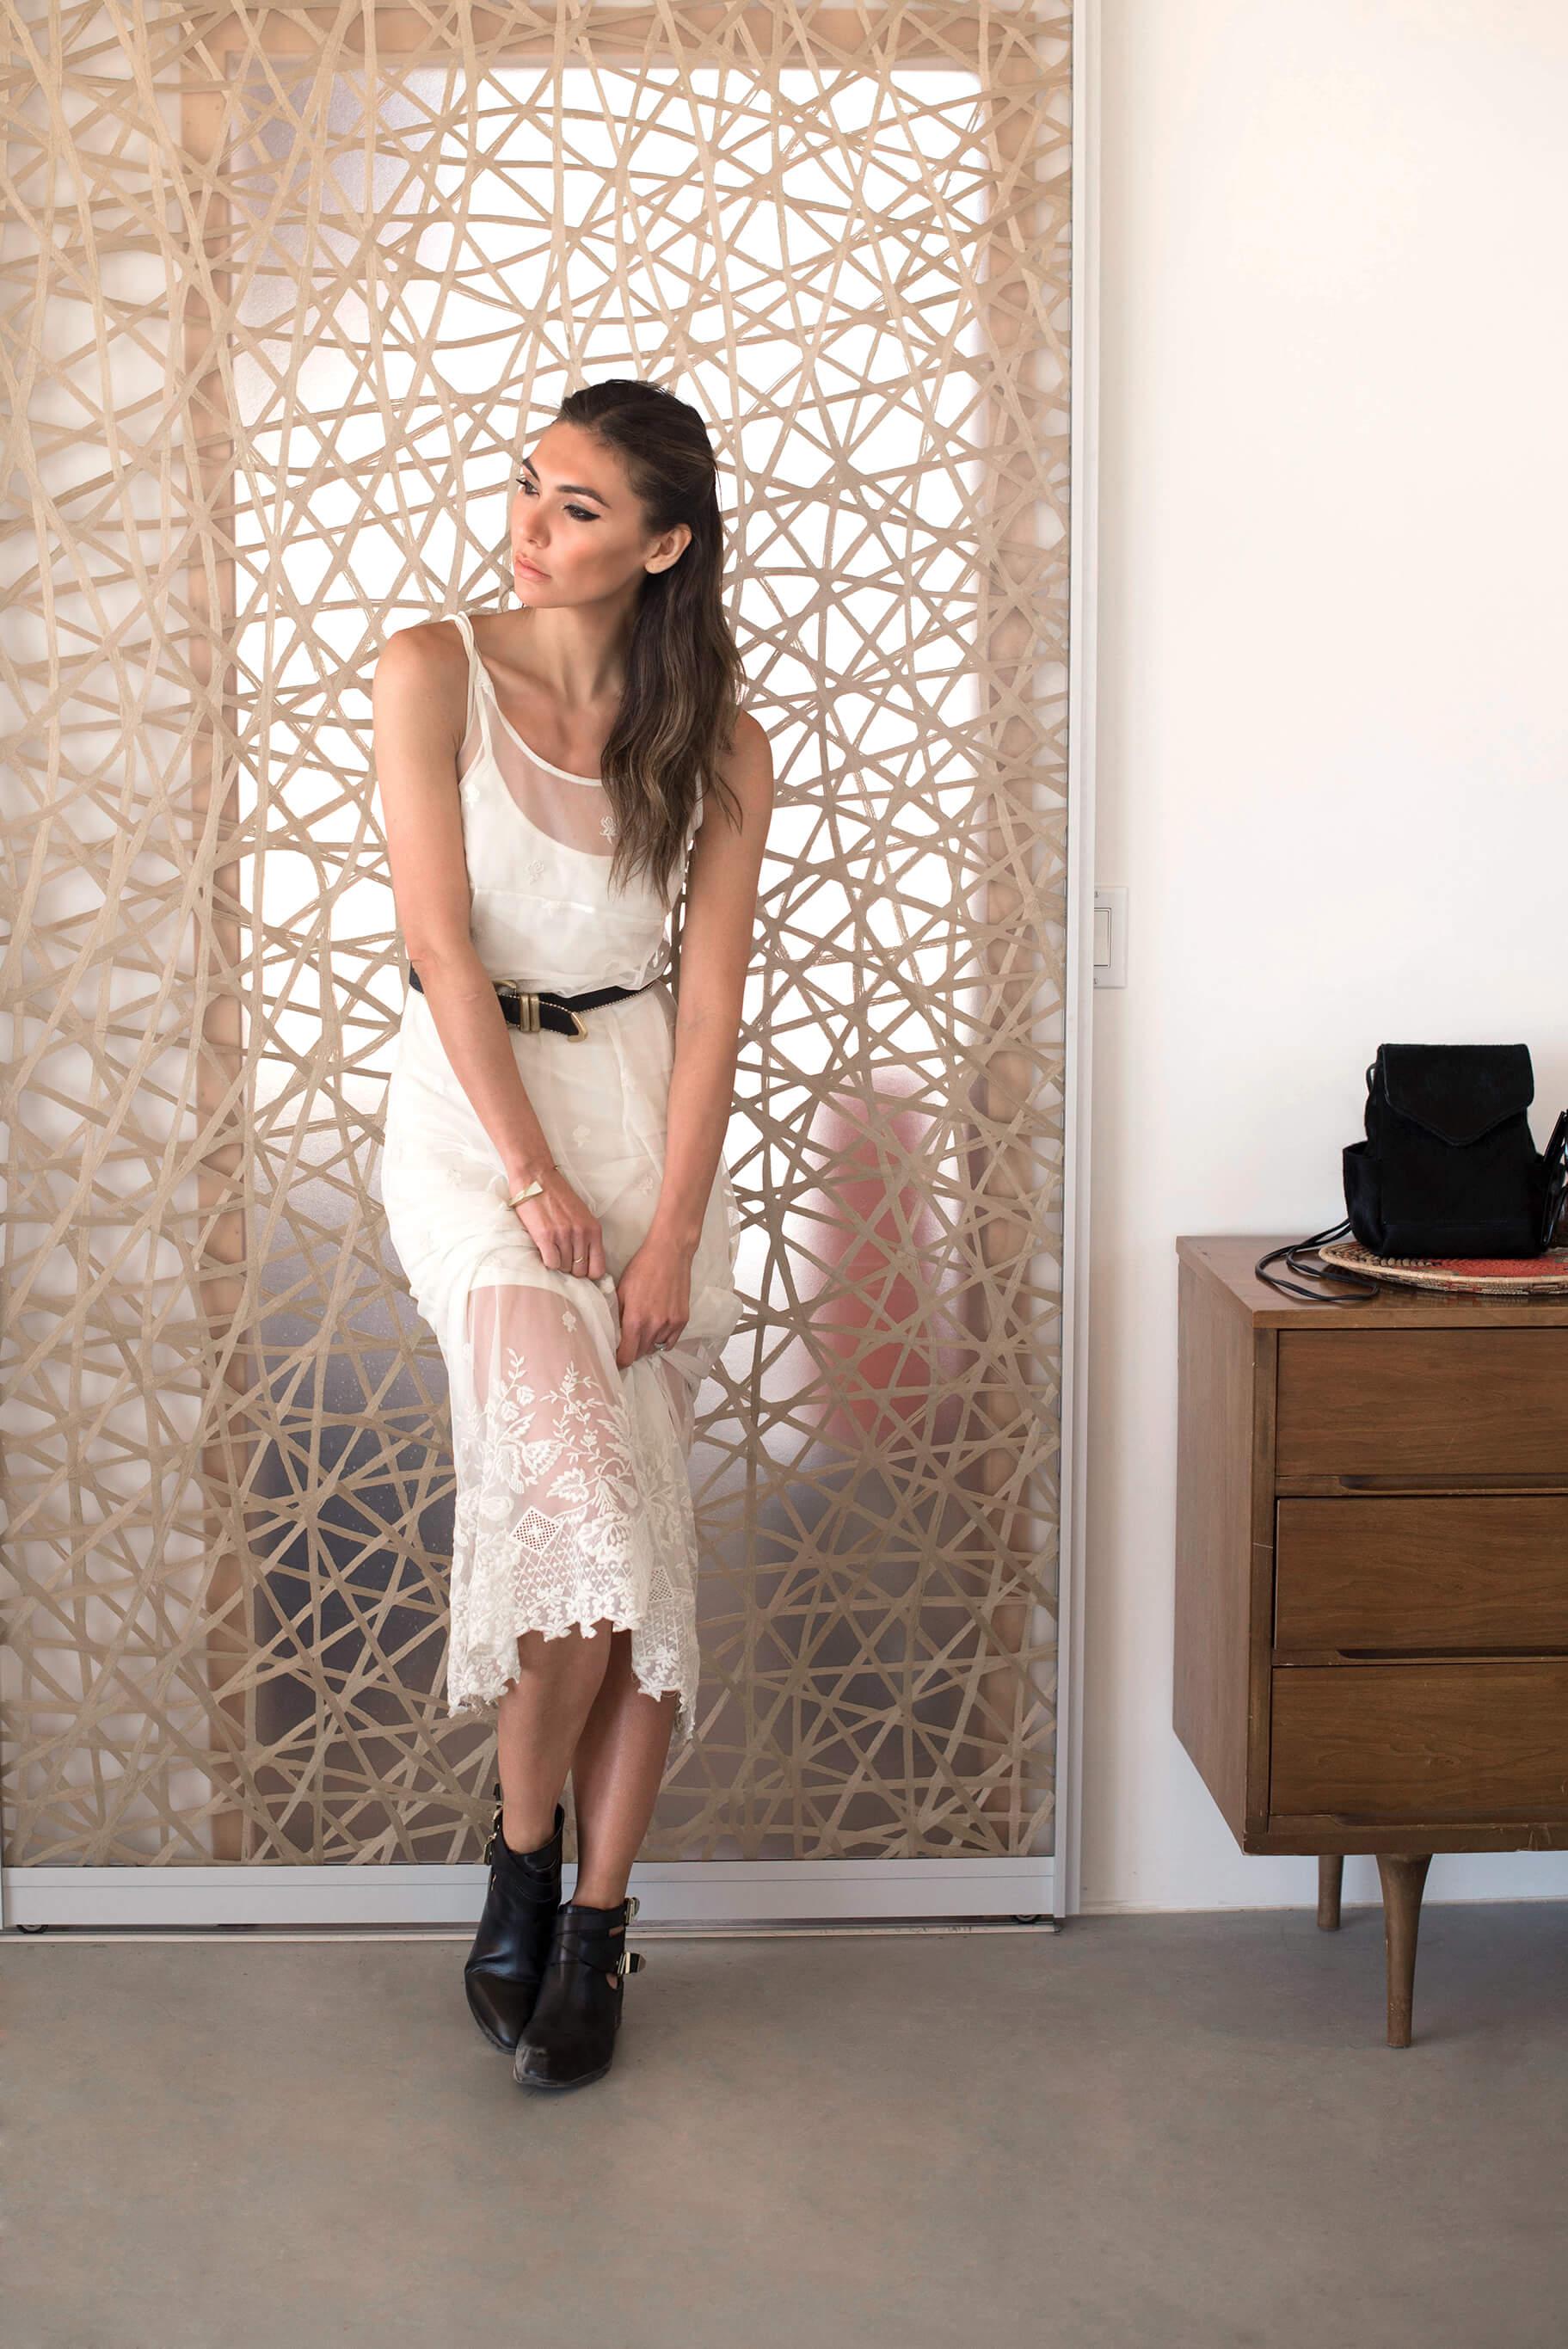 WEARING:   Black Swan Puebla Dress  ,   Seychelles Scoundrel Boots  ,   Ona Chan Bracelet  , Dolce Vita Shoe Strap worn as a belt (  similar here  ),   Oliveve Calfhair Convertible Backpack via Alekka   ,    Céline Audrey Sunglasses